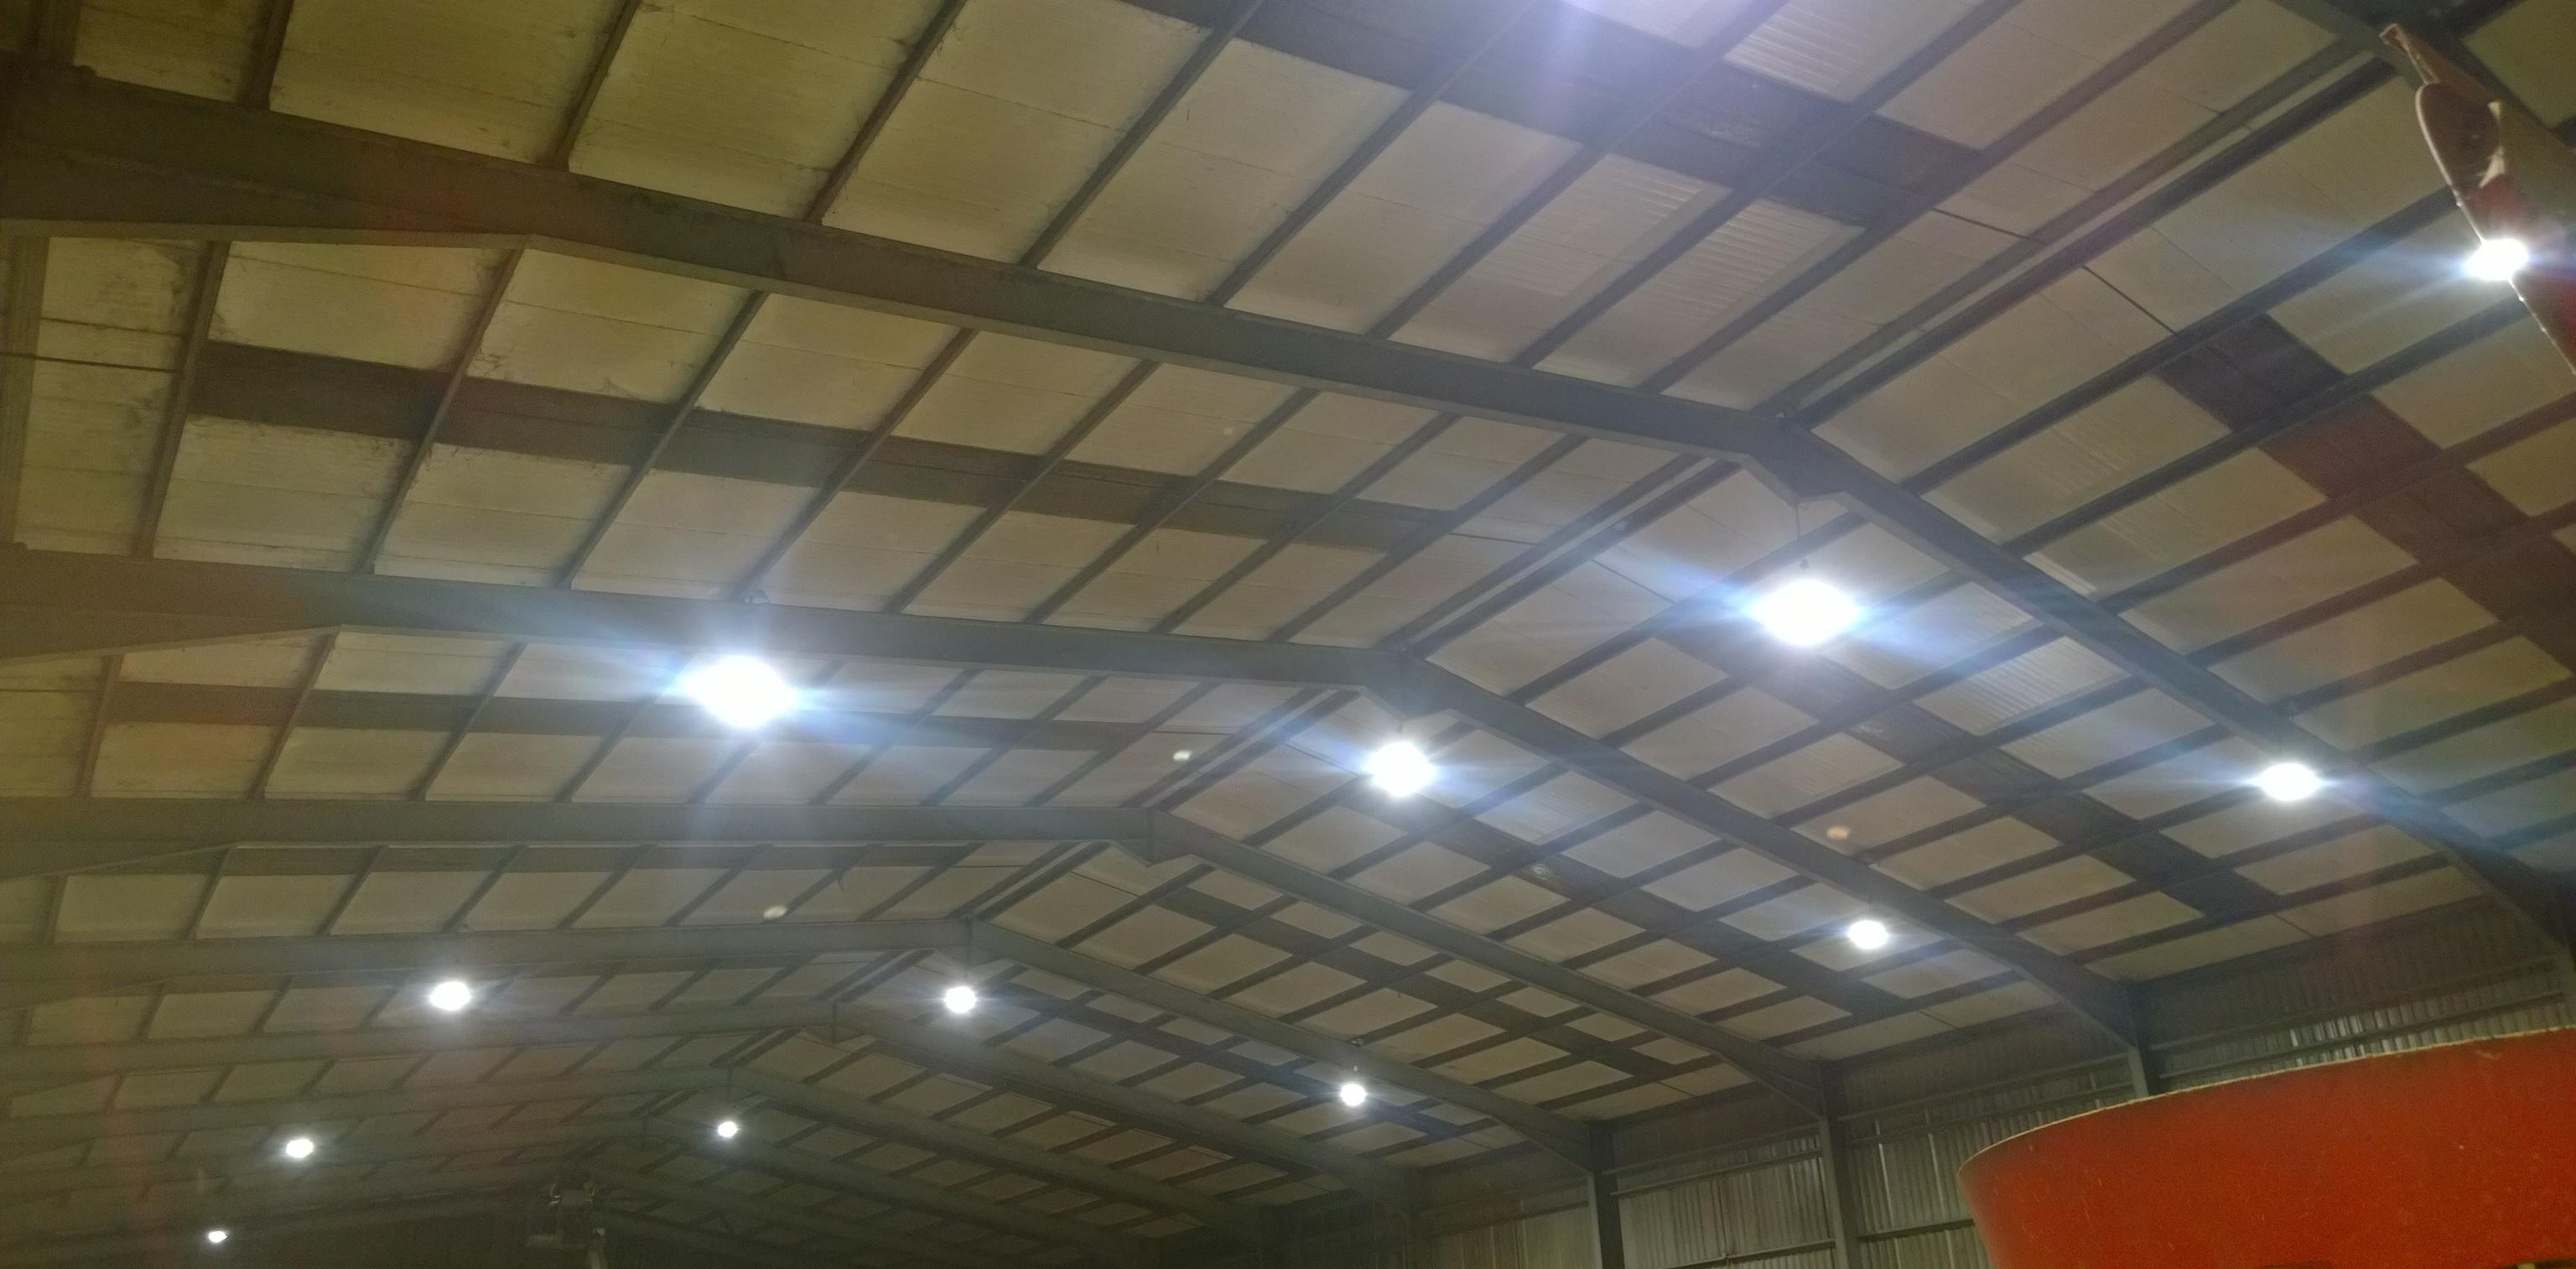 Main photo for K O Electrics Ltd